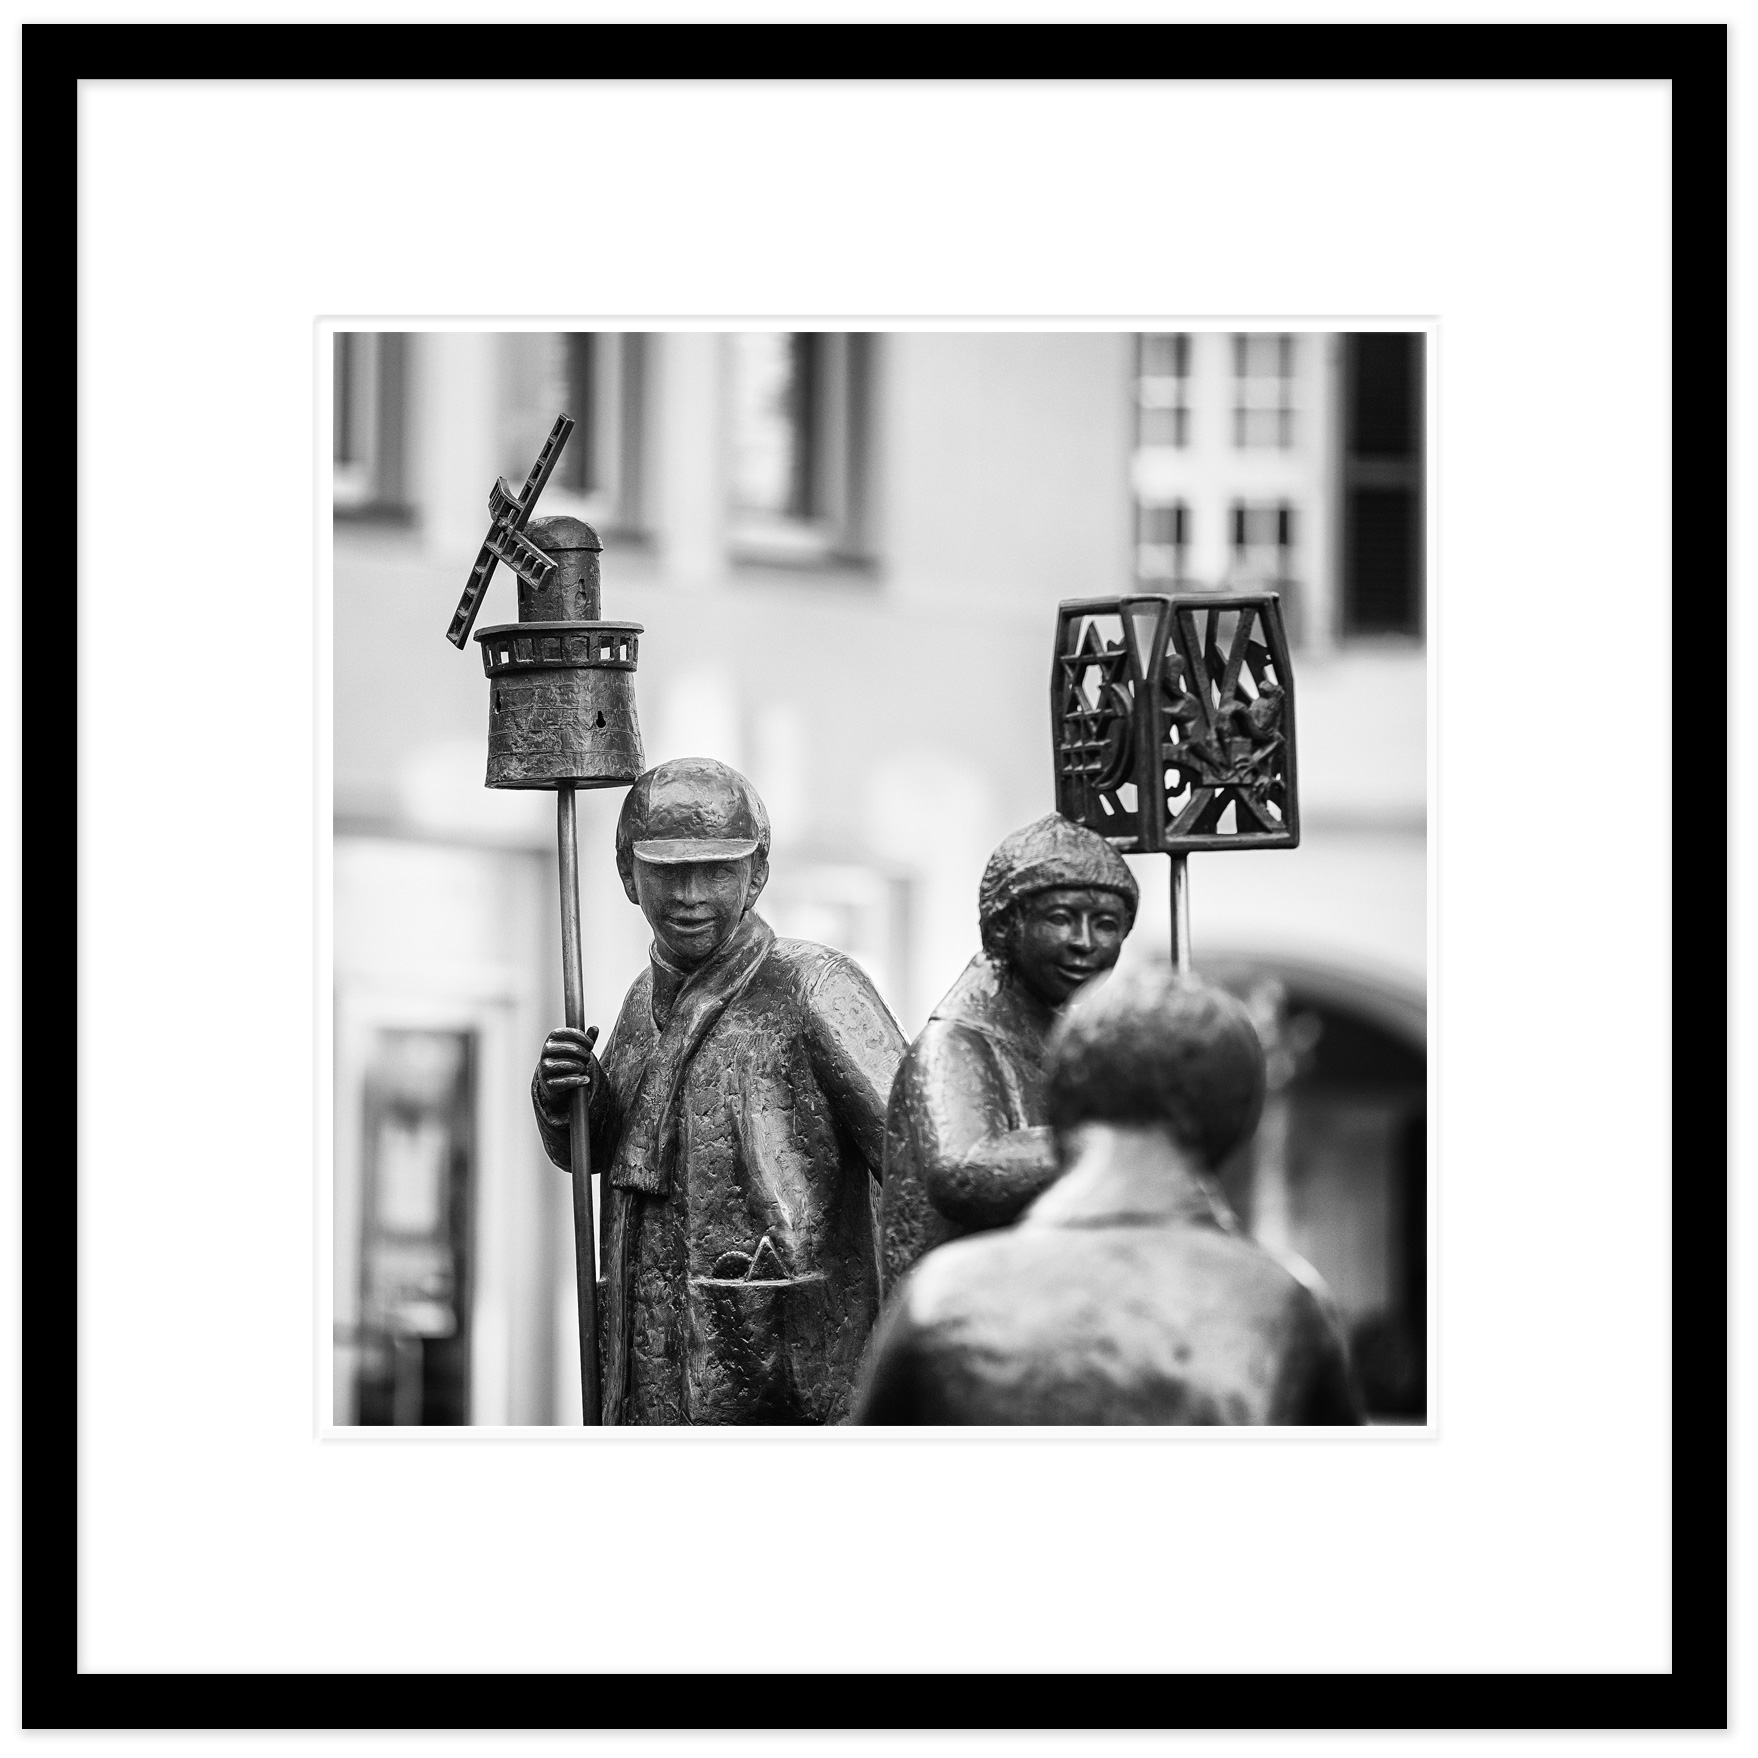 St.-Martin-Statue,-Kempen.jpg